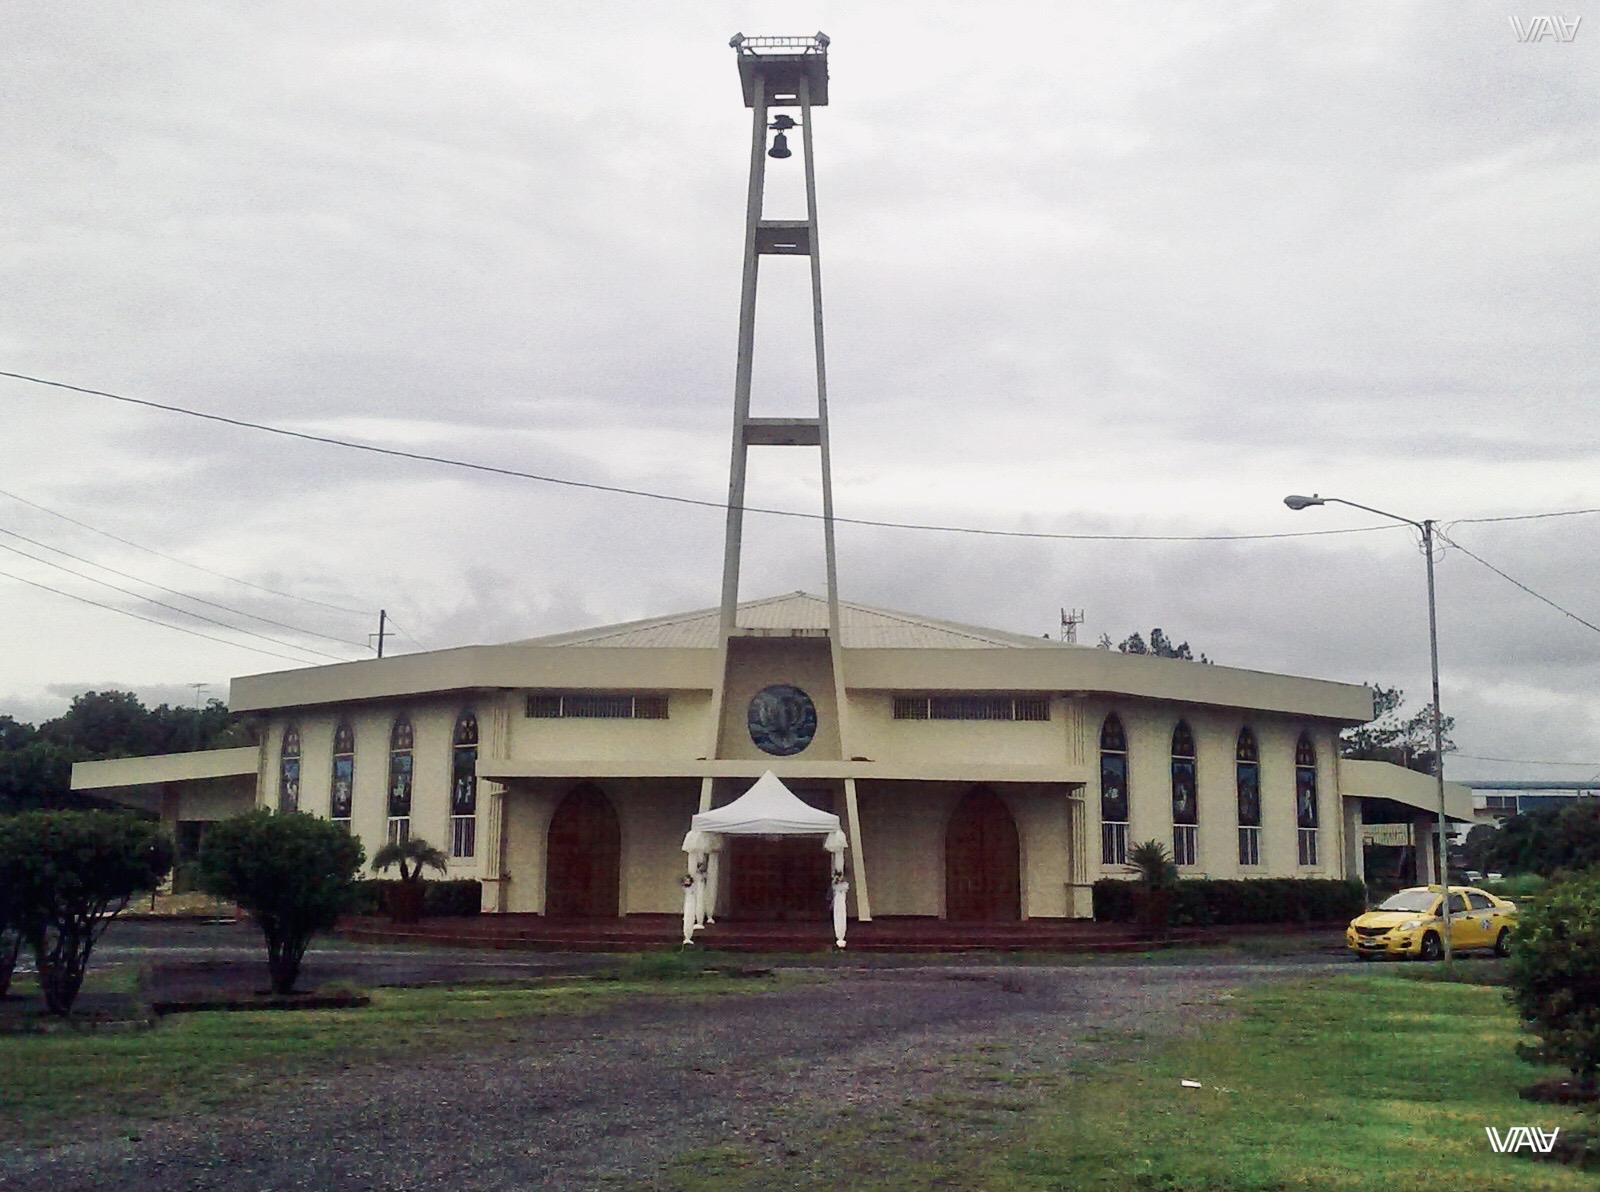 The main church of the Panamanian town David.